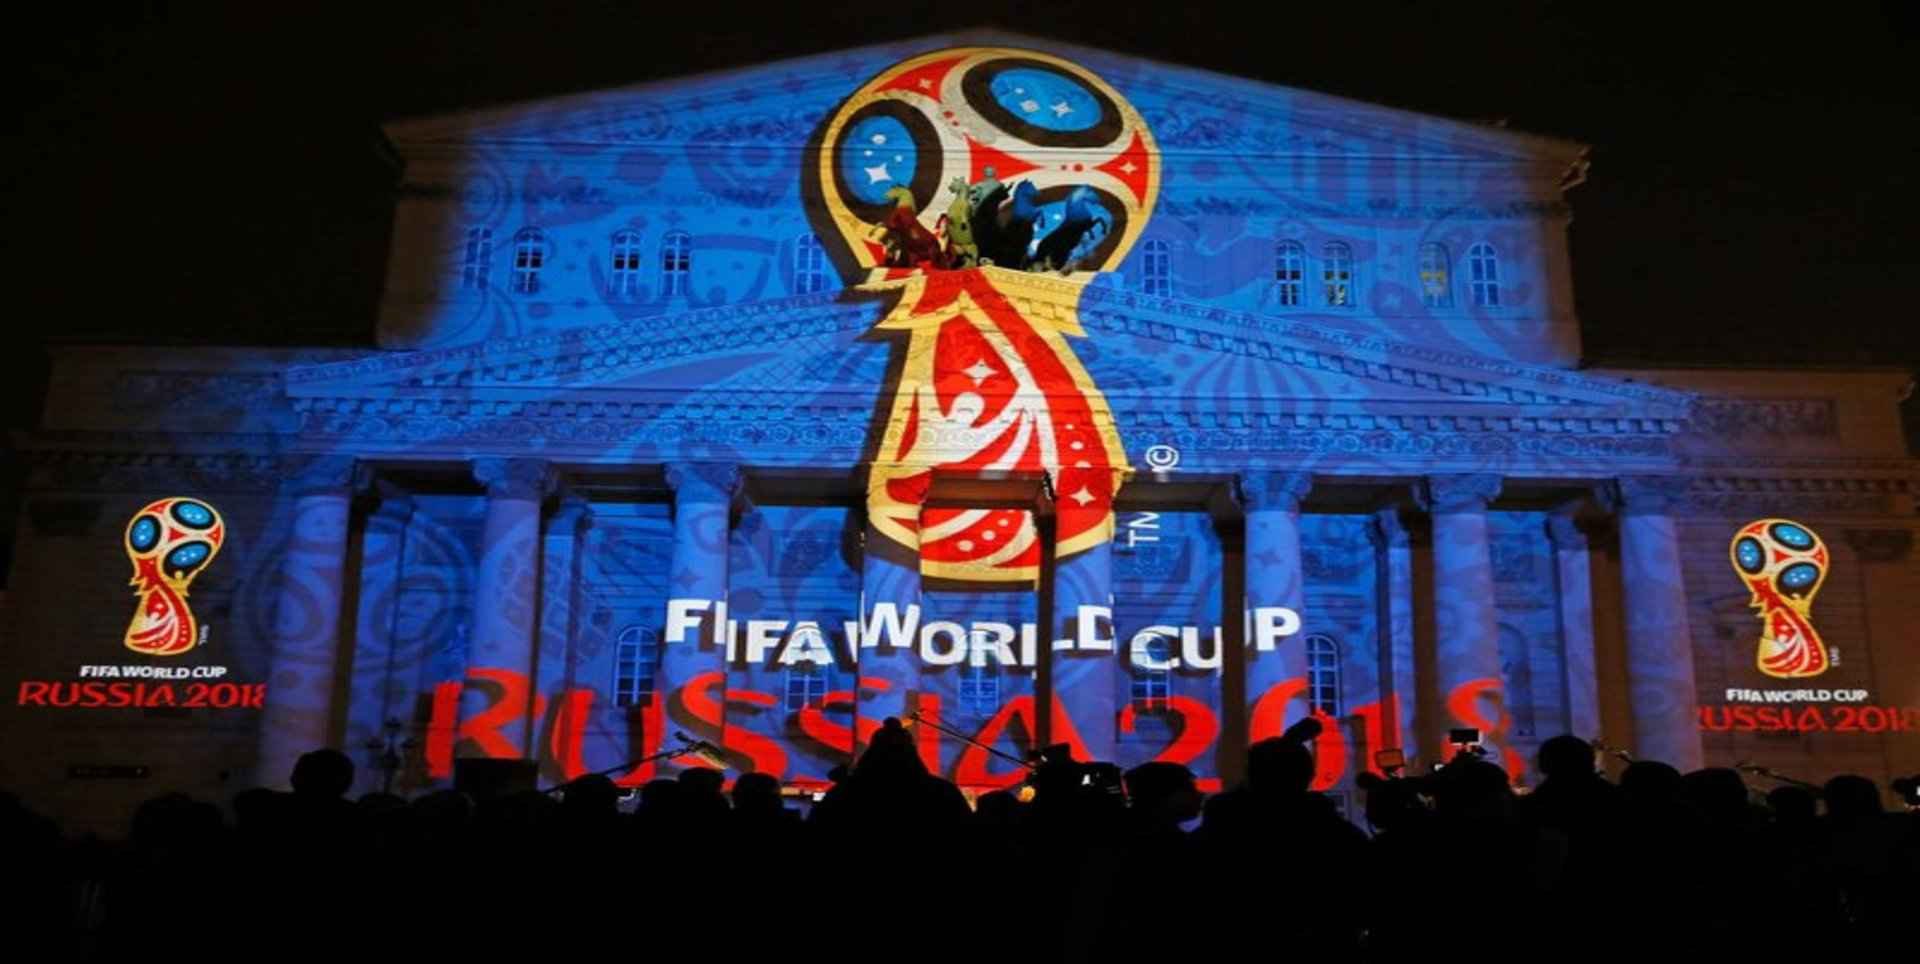 FIFA WC Northern Ireland VS Germany Live